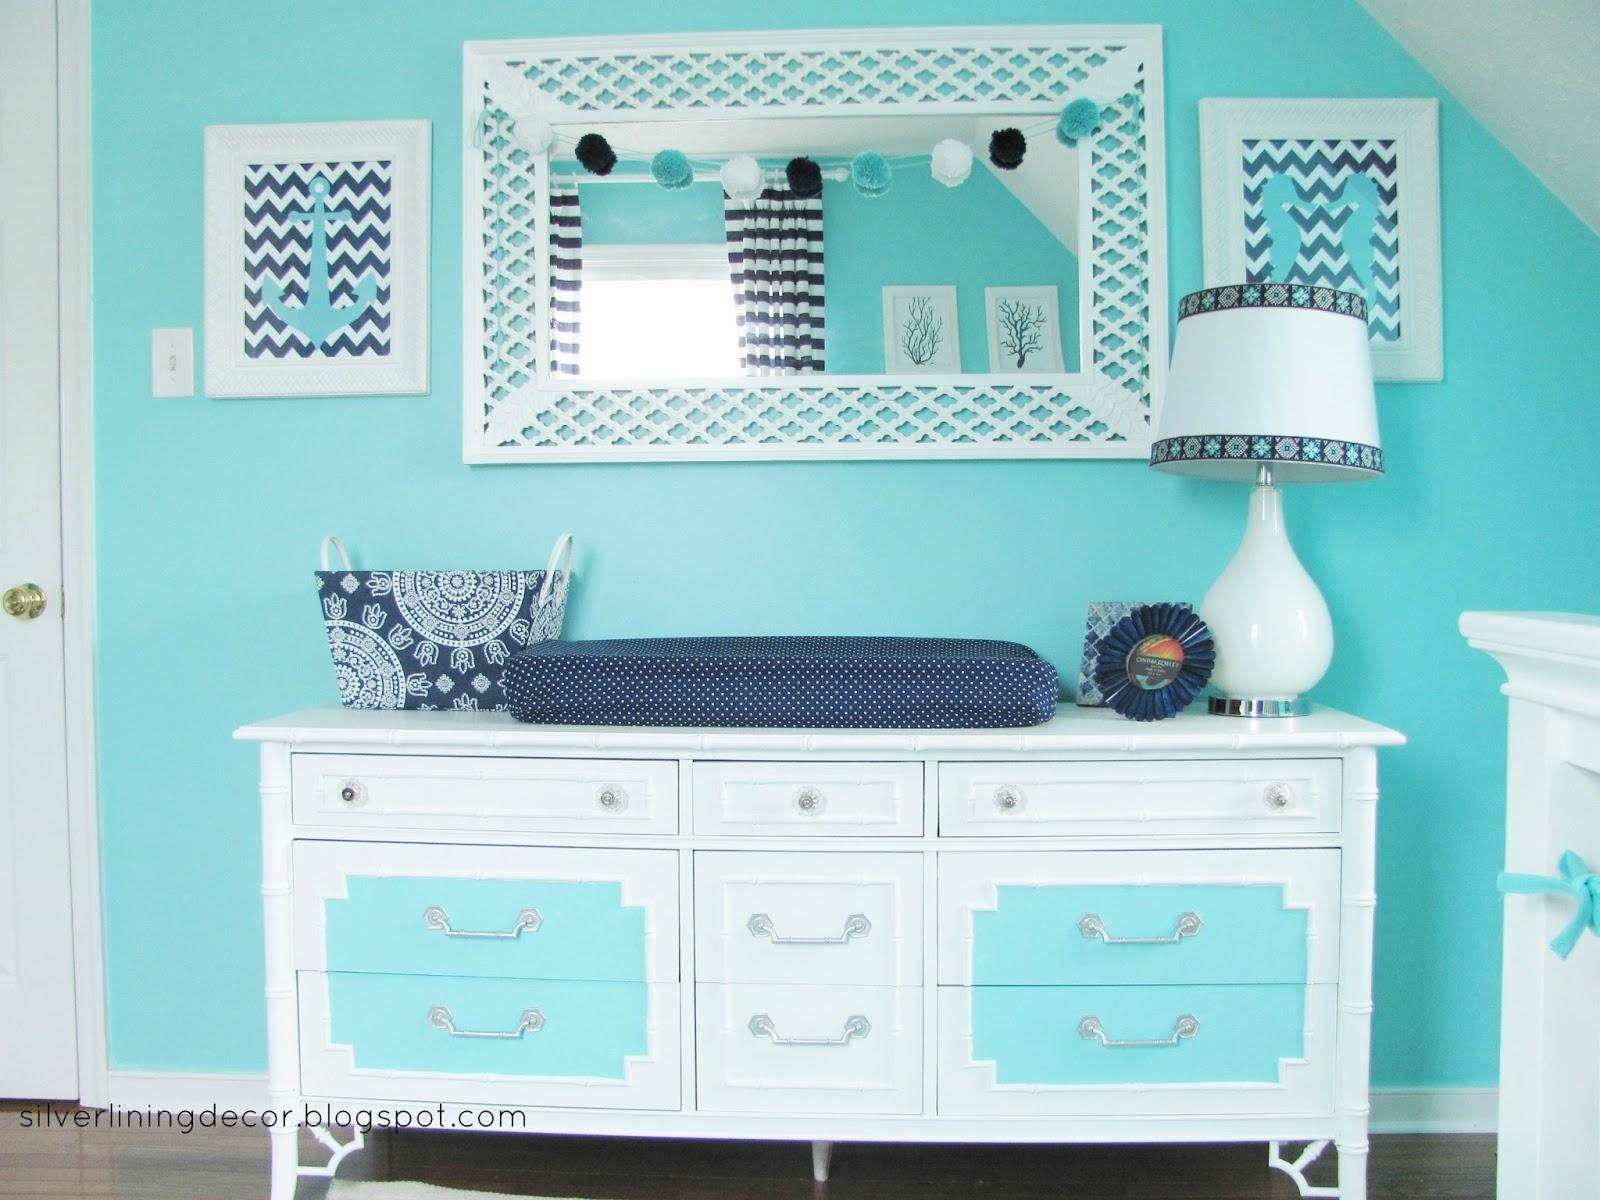 Silver Lining Decor Nautical Nursery Reveal - cheap home decor for nautical nursery